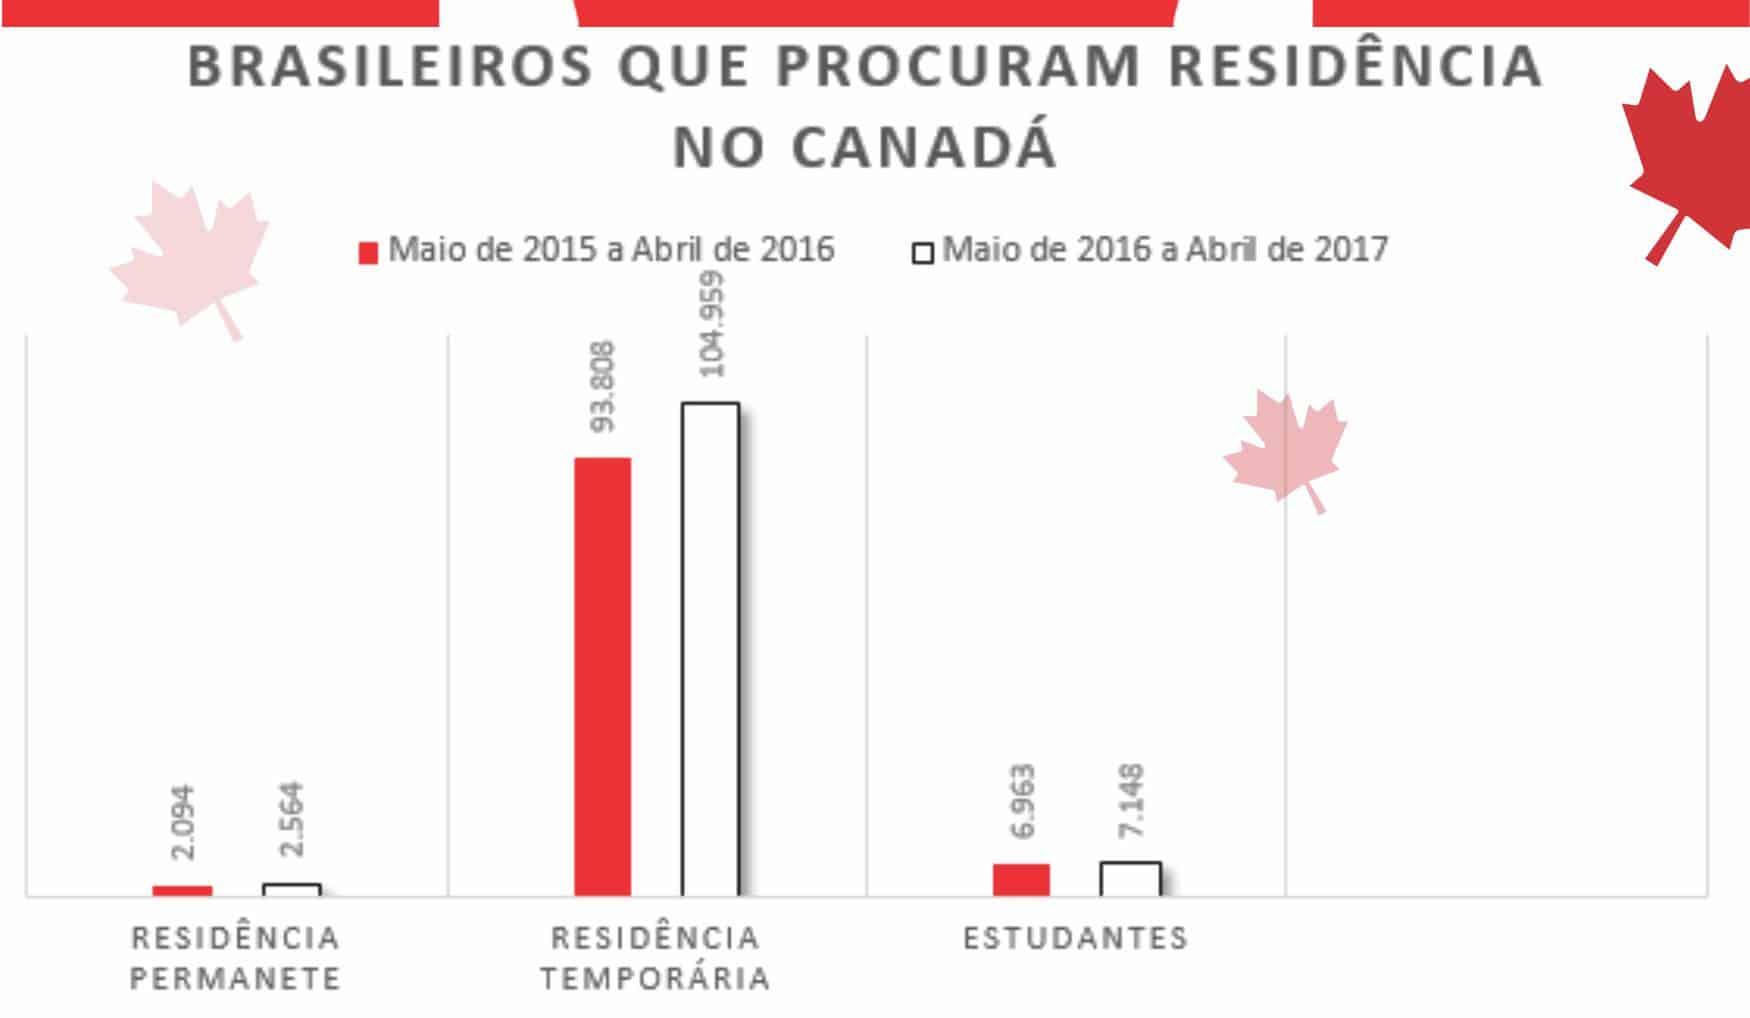 Brasileiros que Procuram Residencia no Canadá